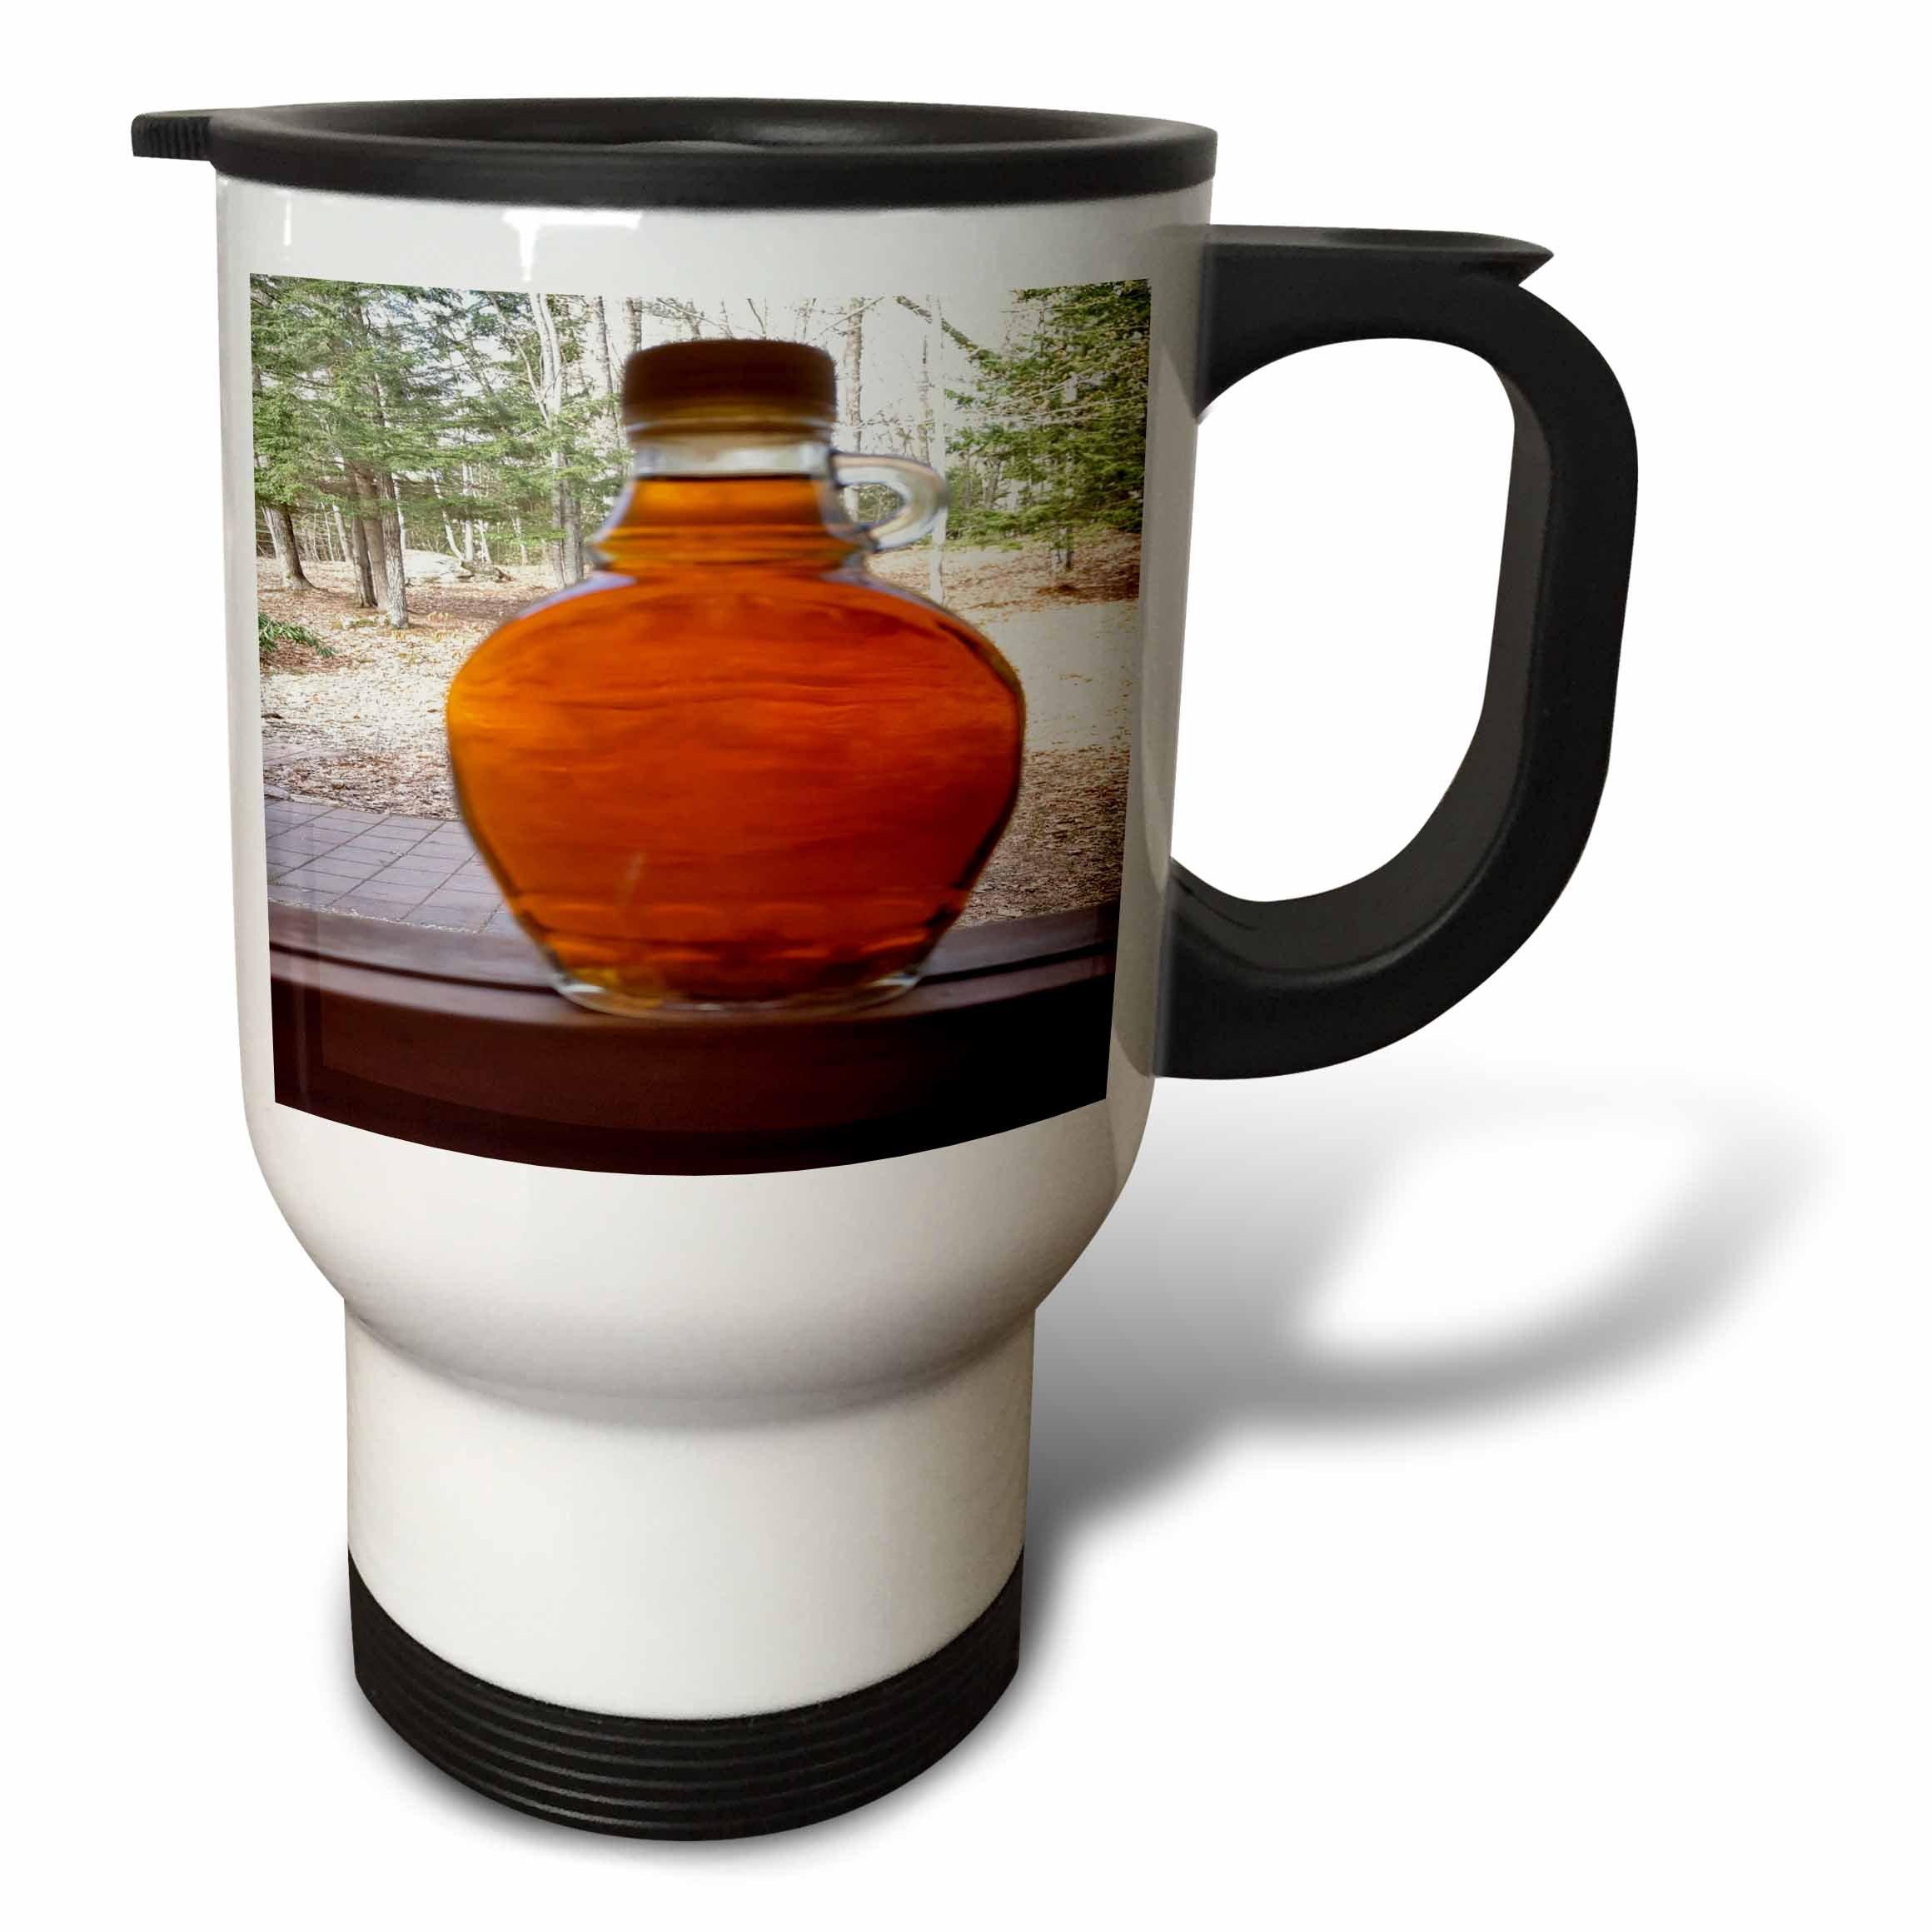 3dRose TDSwhite – Miscellaneous Photography - Maple Syrup Bottle Windowsill - 14oz Stainless Steel Travel Mug (tm_285357_1)